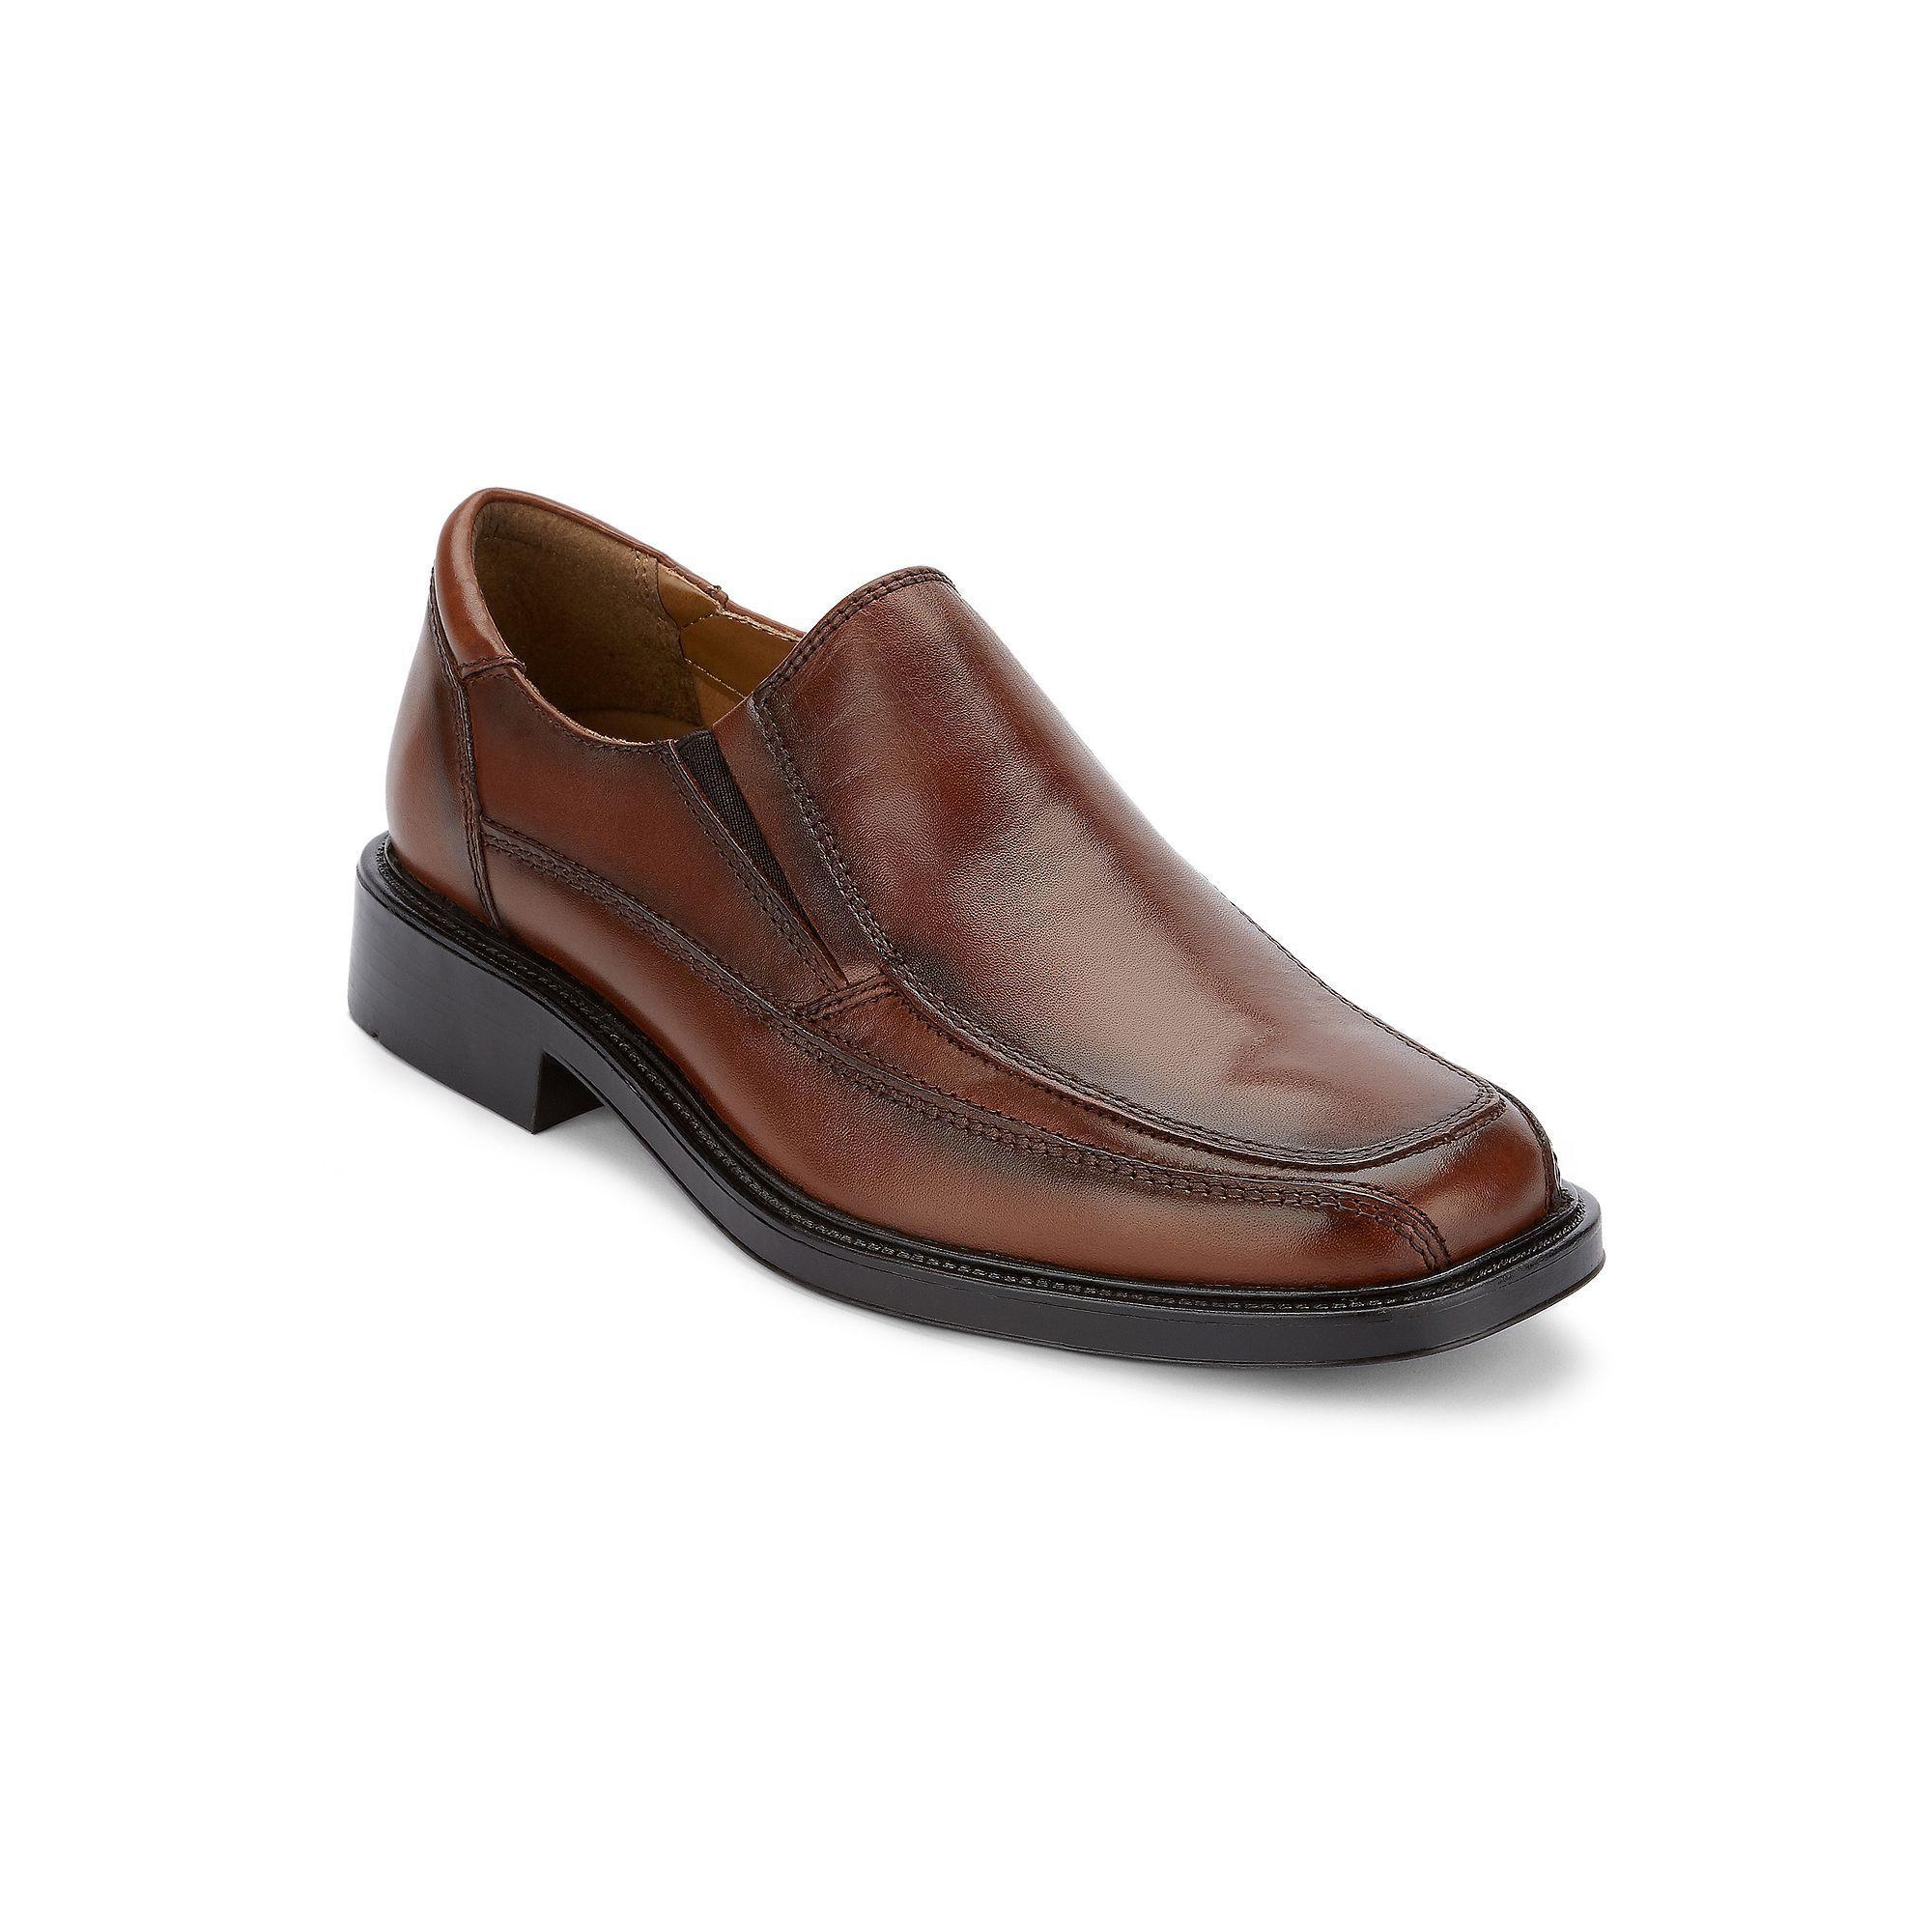 Dockers Proposal Men's SlipOn Shoes, Size medium (11.5